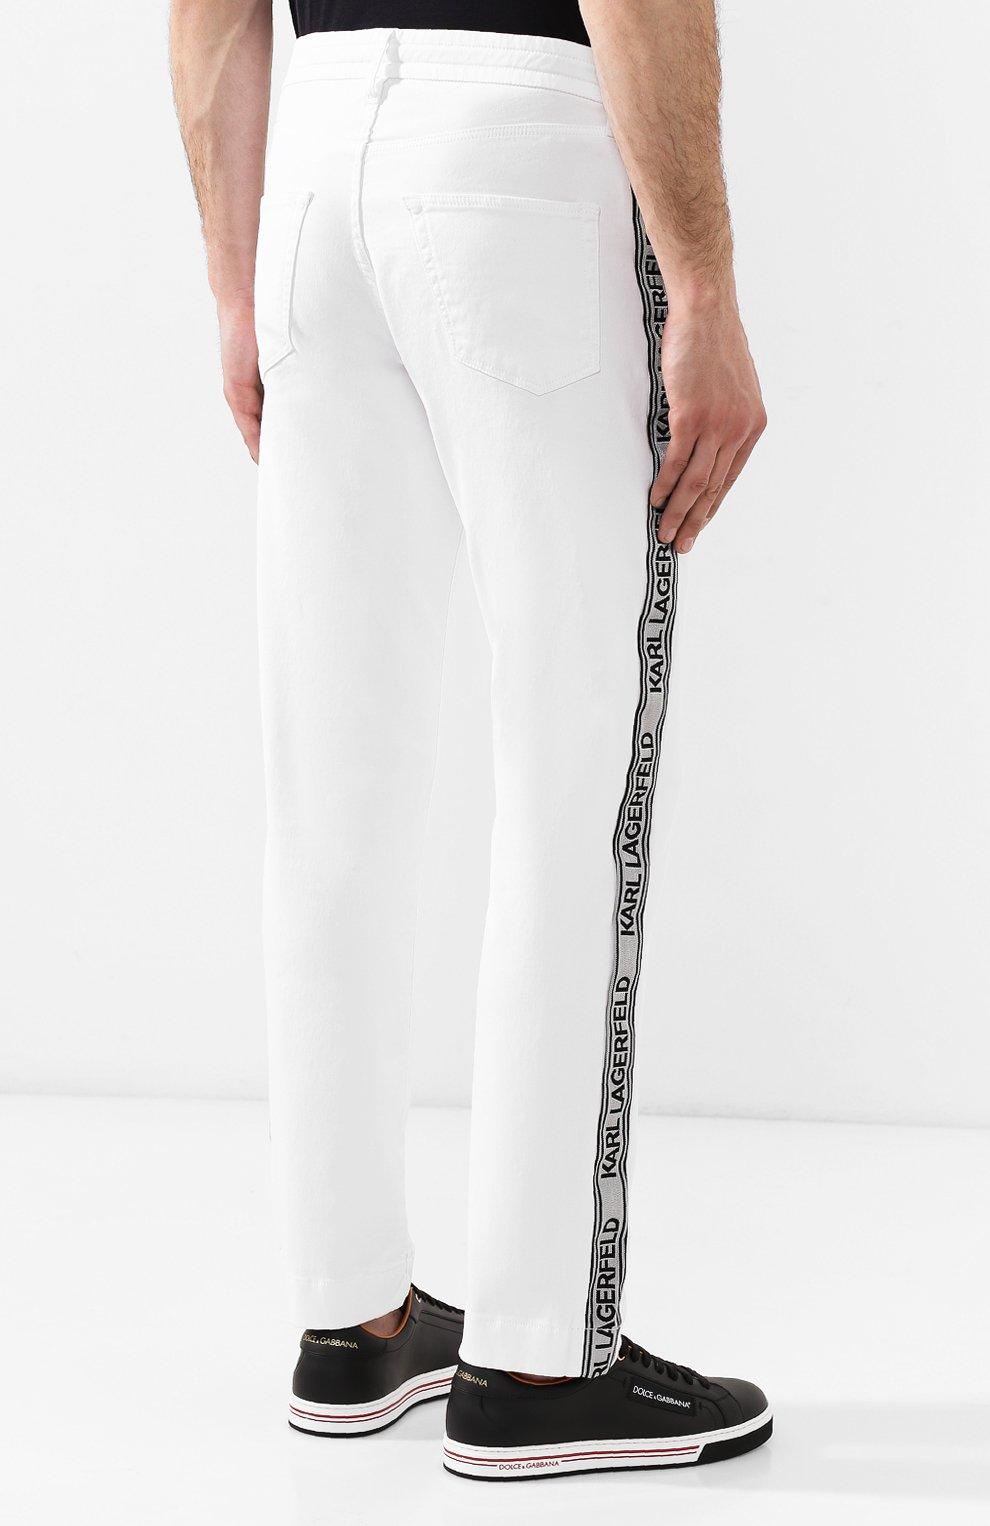 Джинсы Karl Lagerfeld denim белые | Фото №4